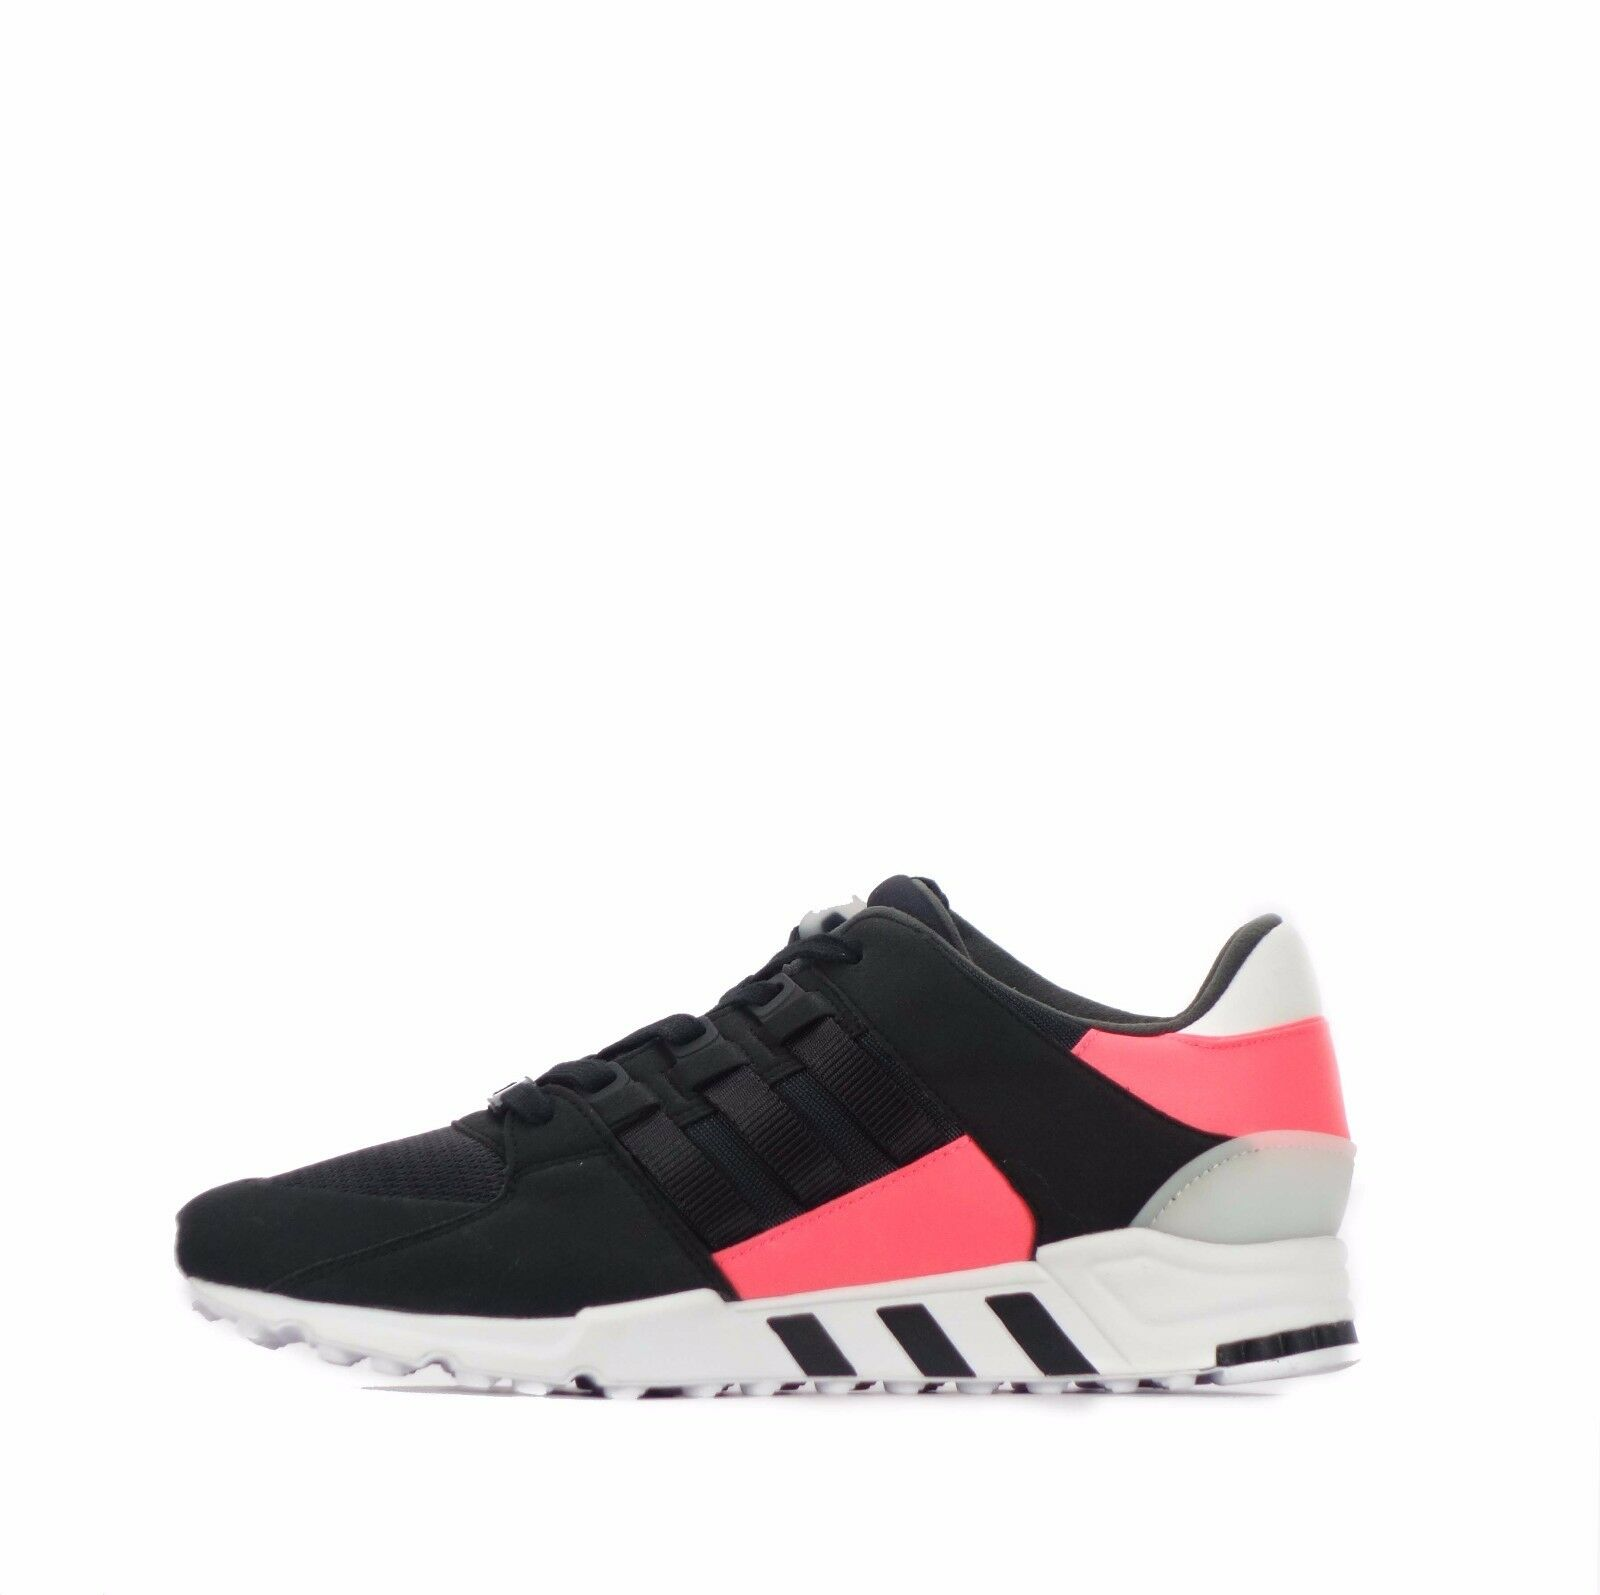 adidas Originals EQT Support RF Herren Schuhe schwarz / Turbo